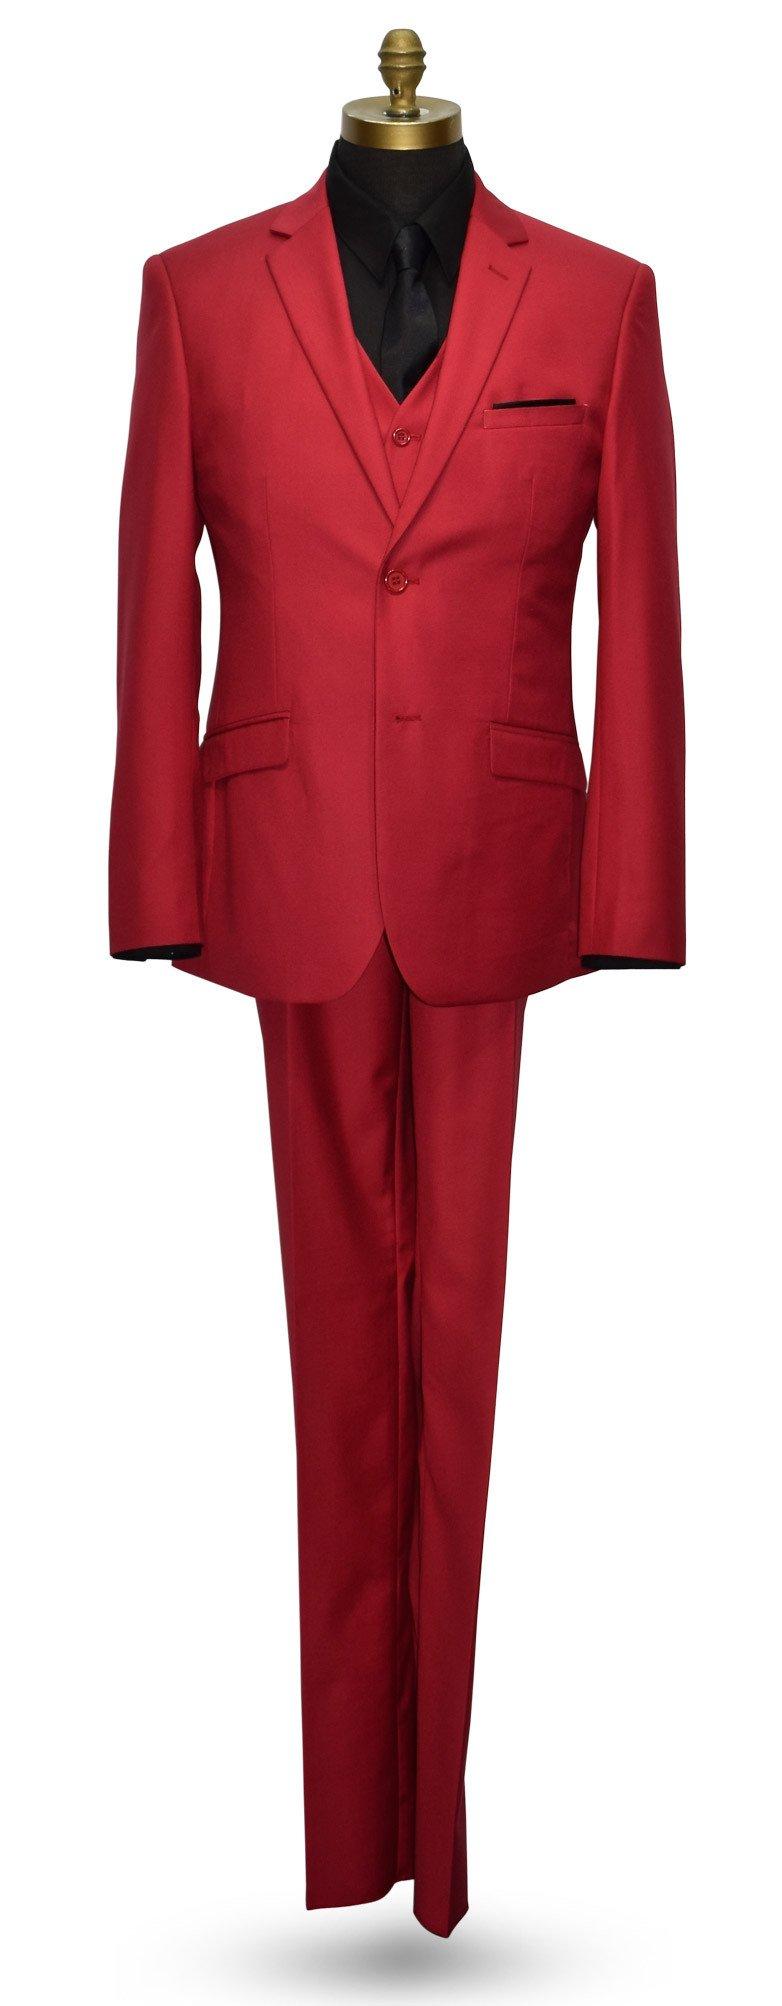 Cardinal Red Suit - 3 Piece